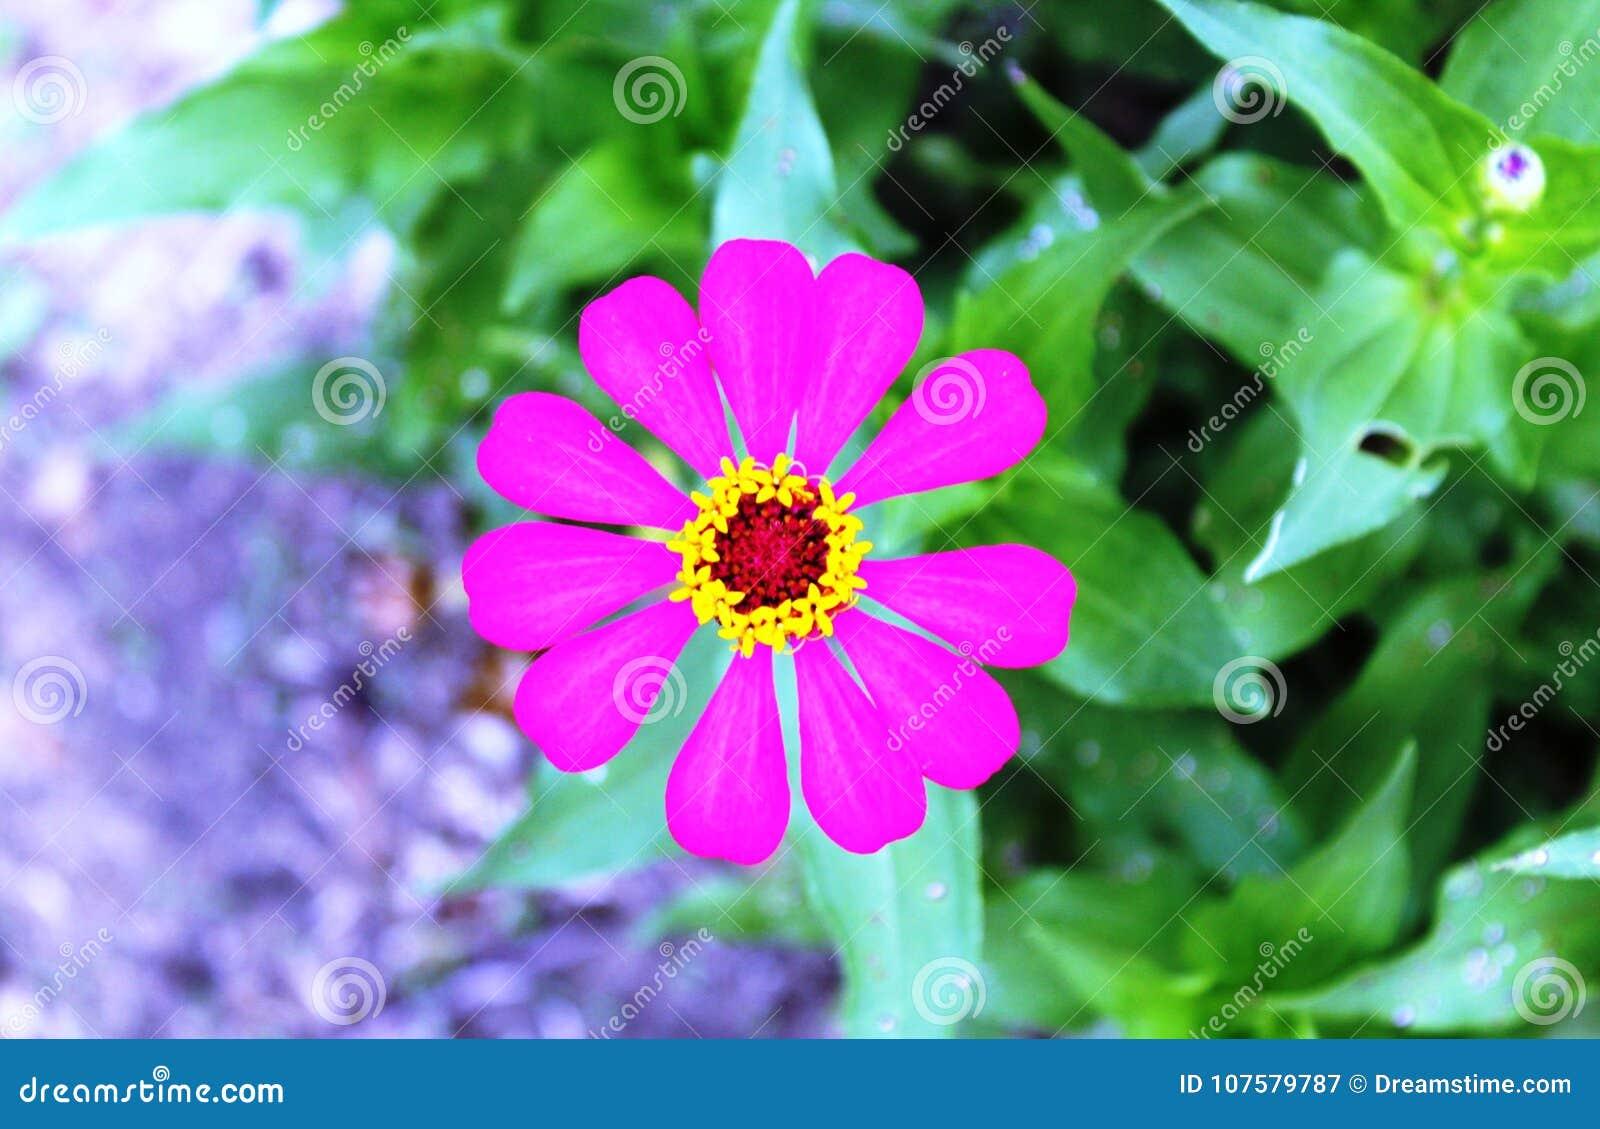 How to Make a Paper Zinnia Flower   934x1300